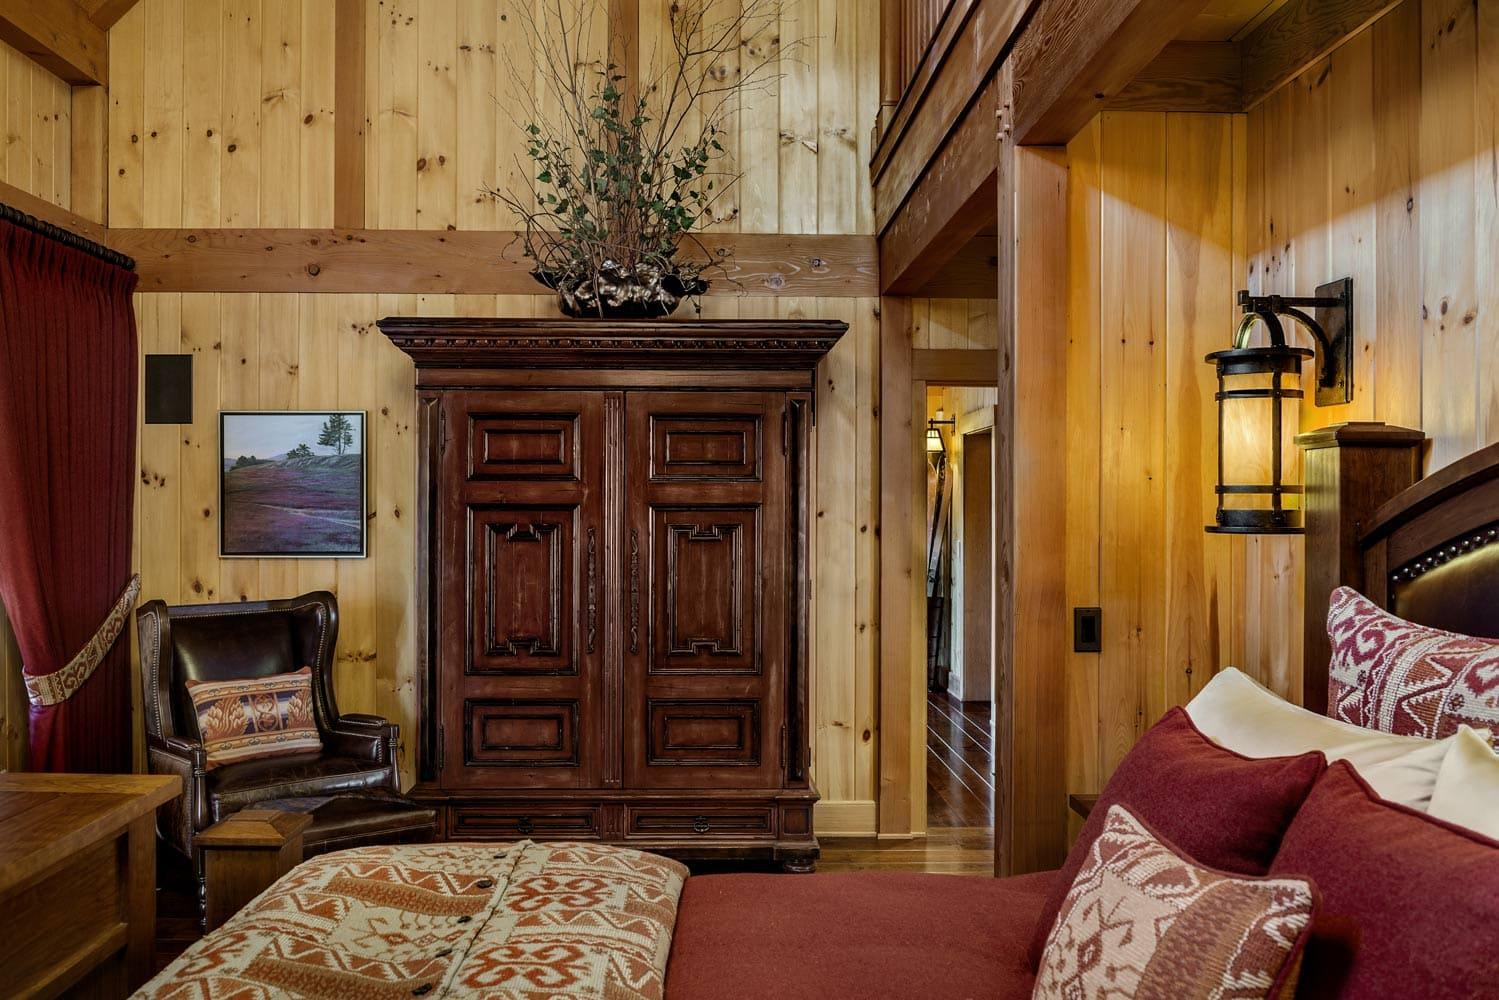 new-hampshire-nh-bedroom-interior